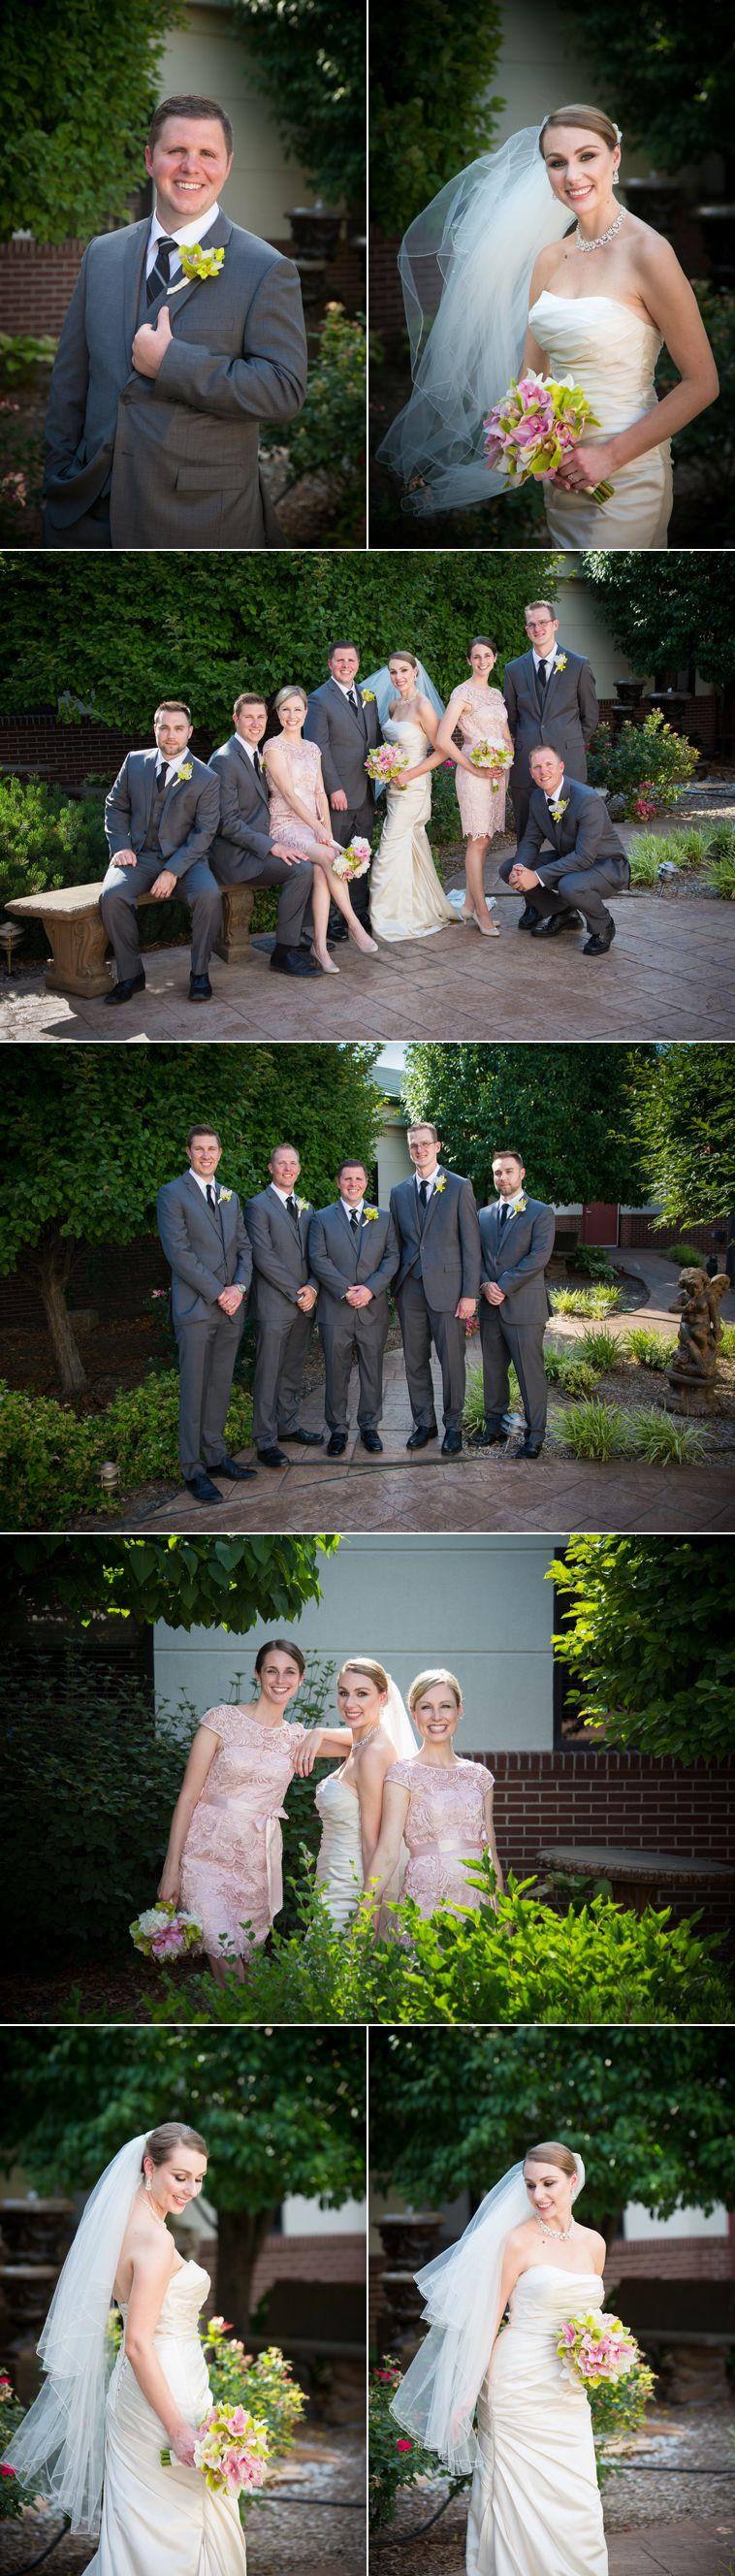 07_KC Wedding Photographer